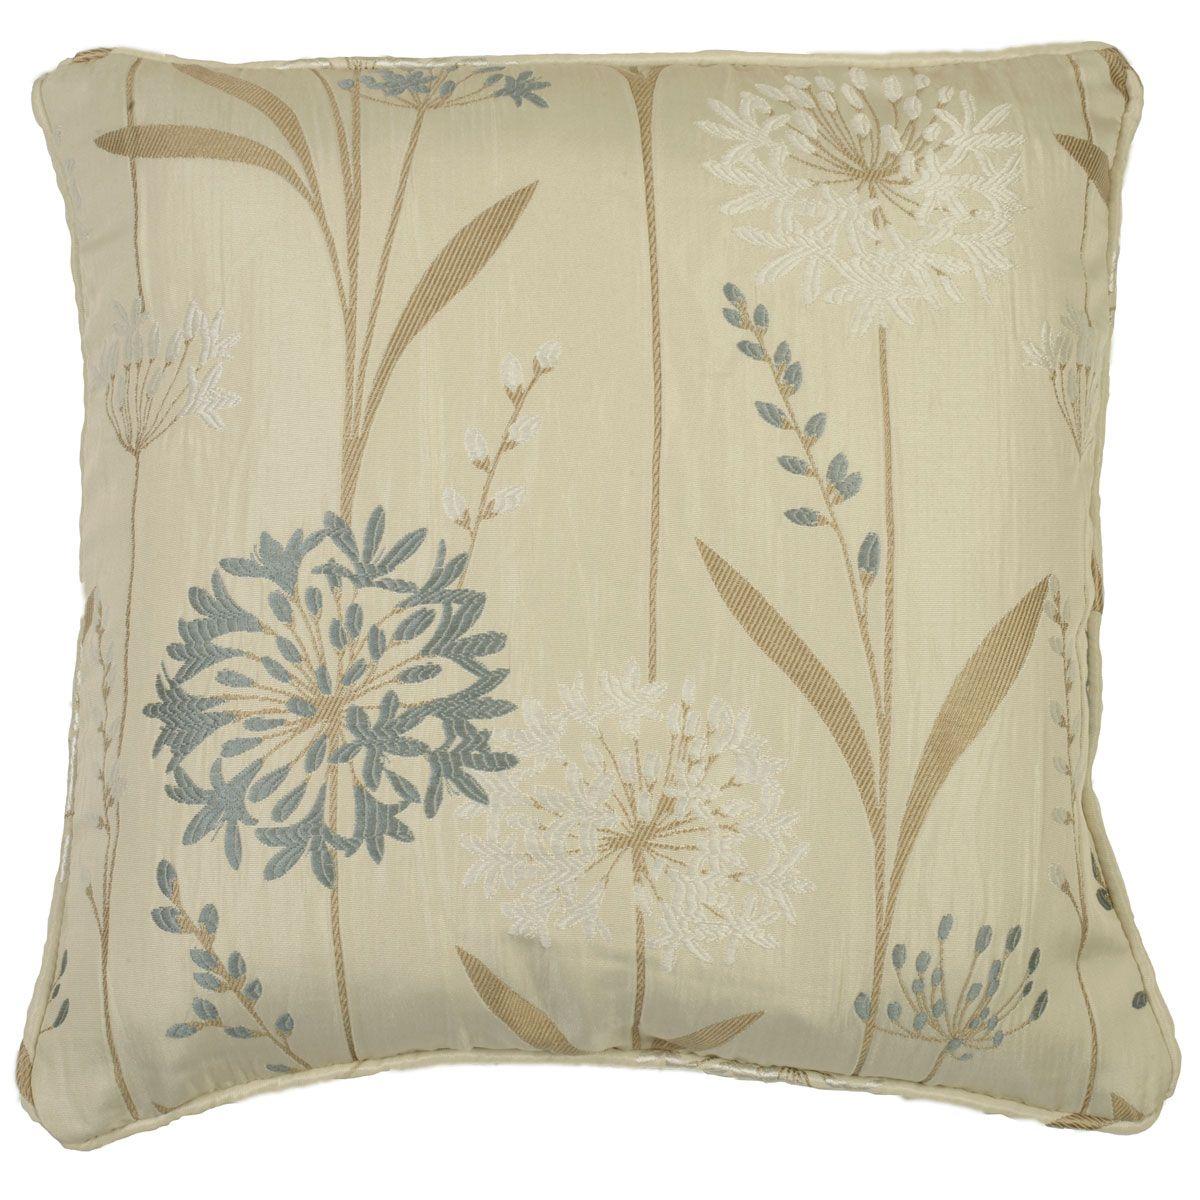 Santorini Filled Cushion - Cornflower